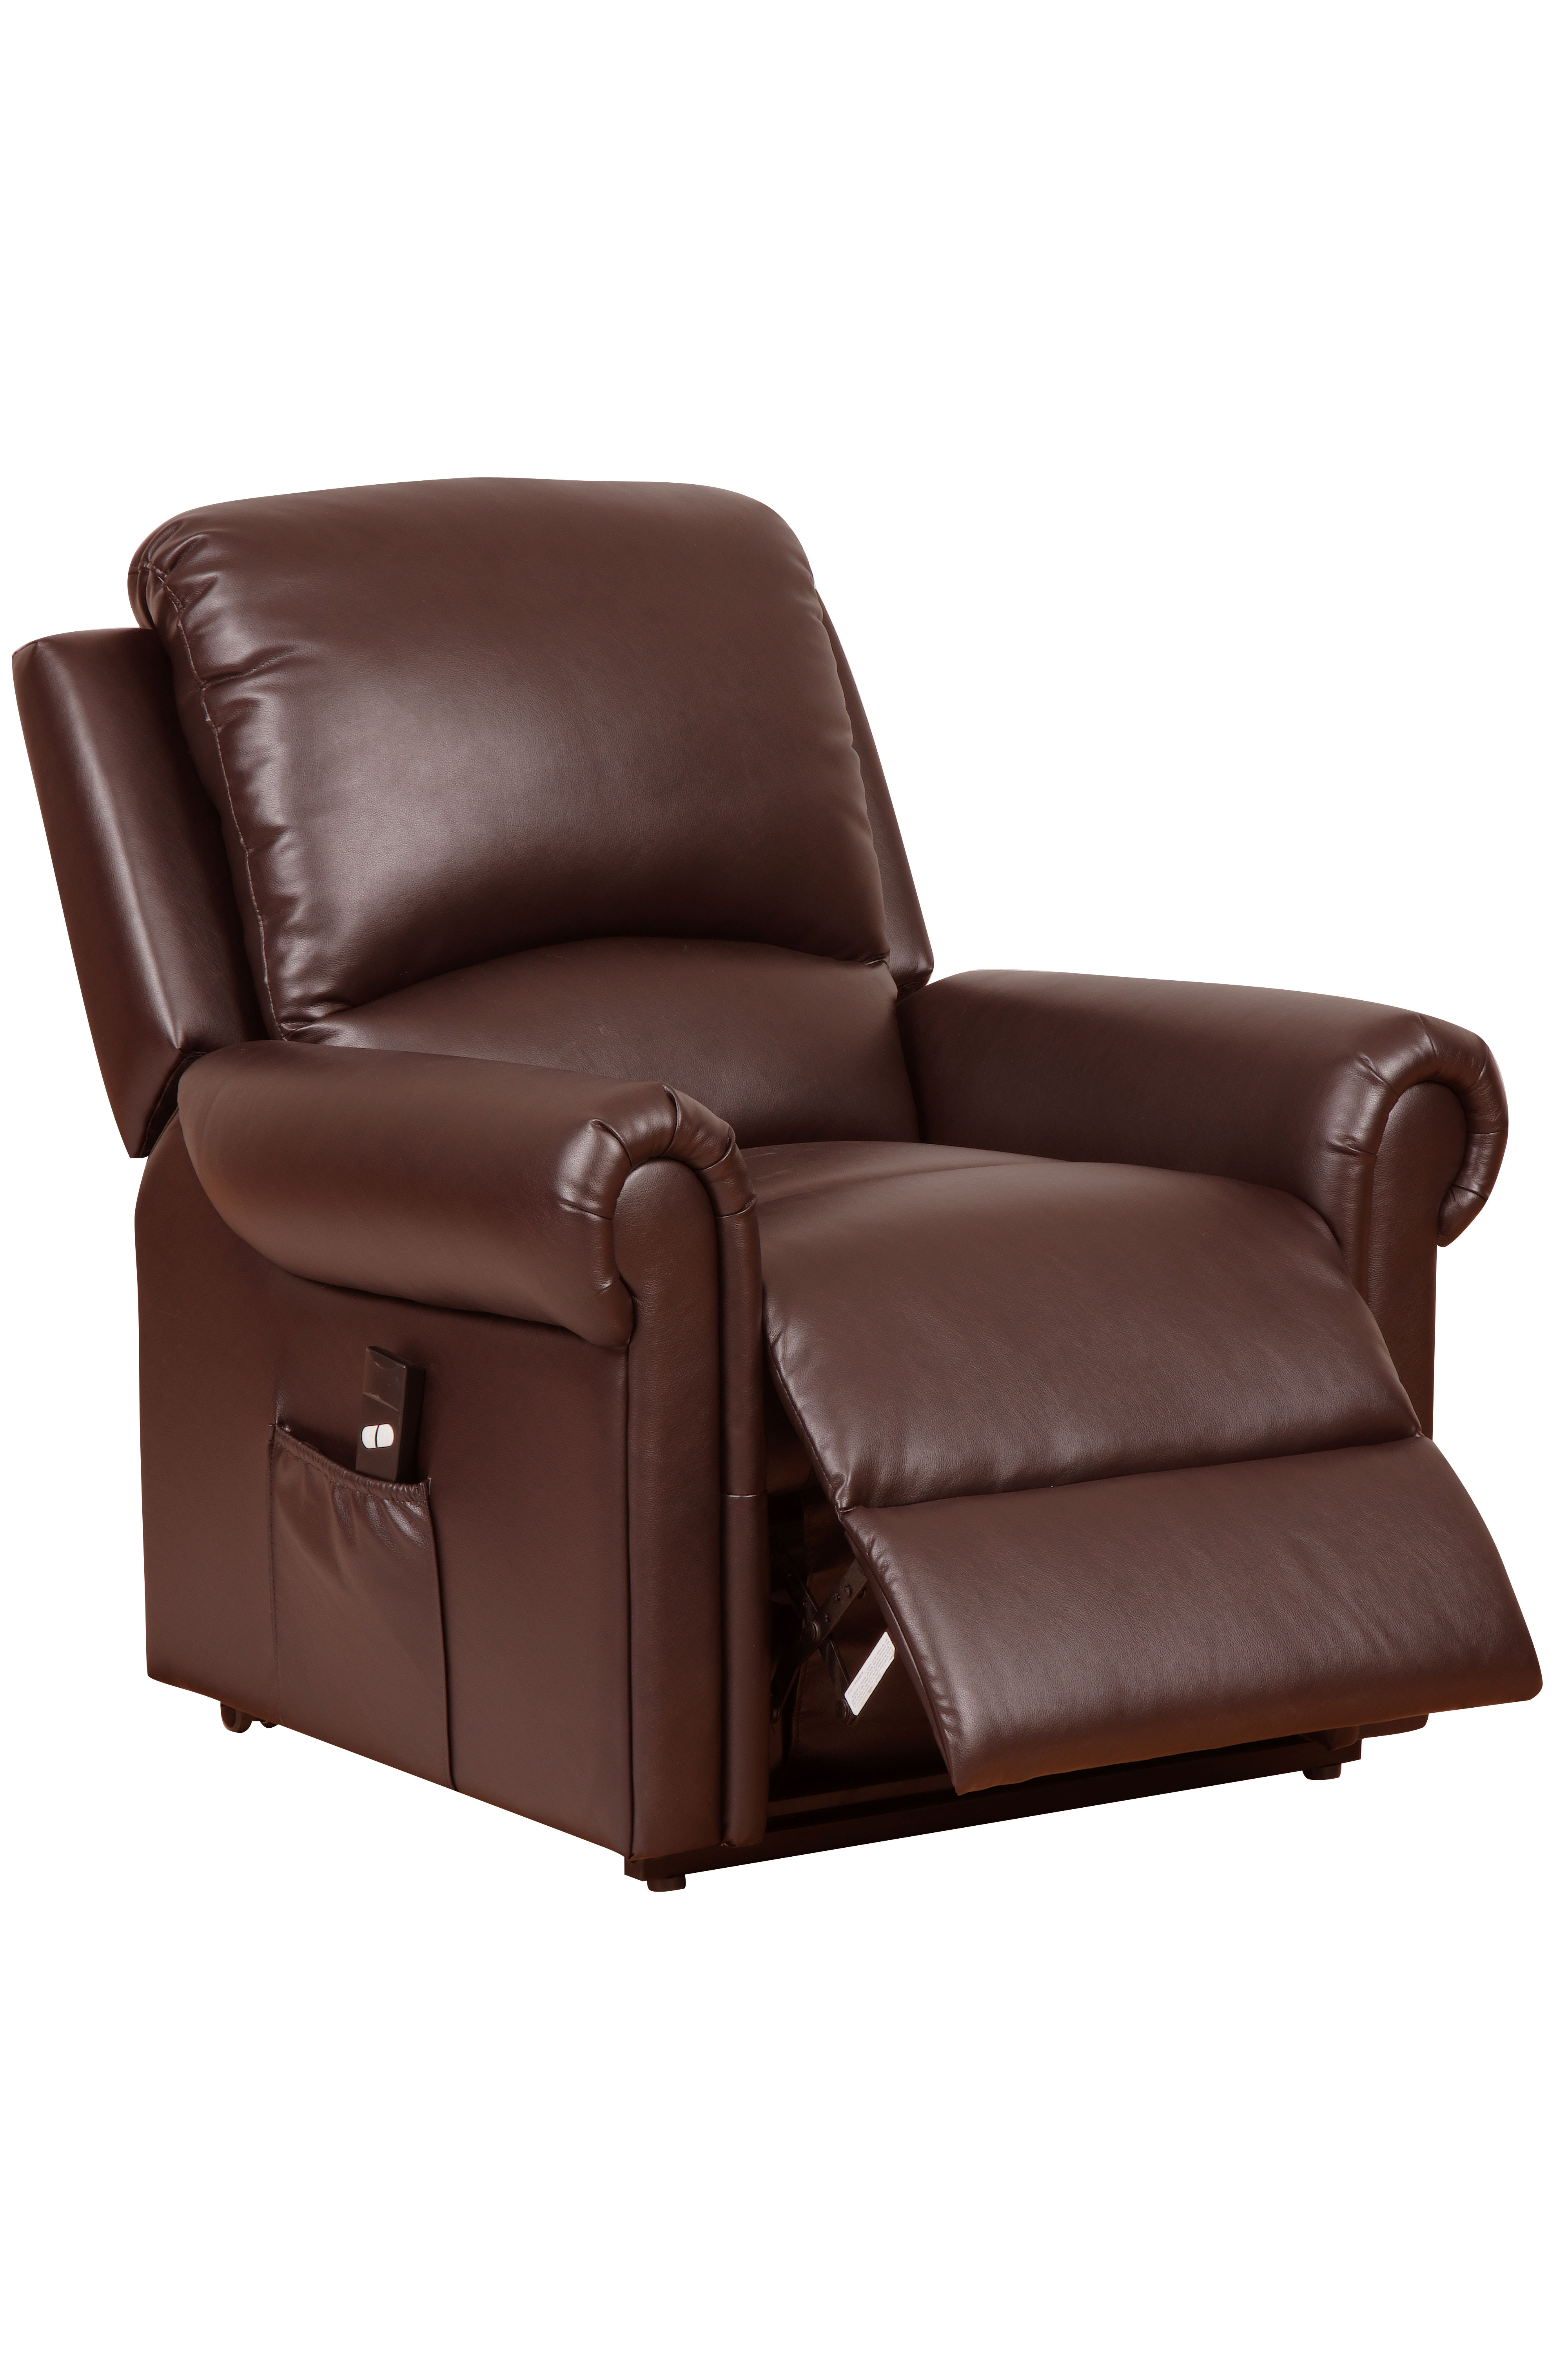 gfa tetbury single motor leather riser recliner nut brown